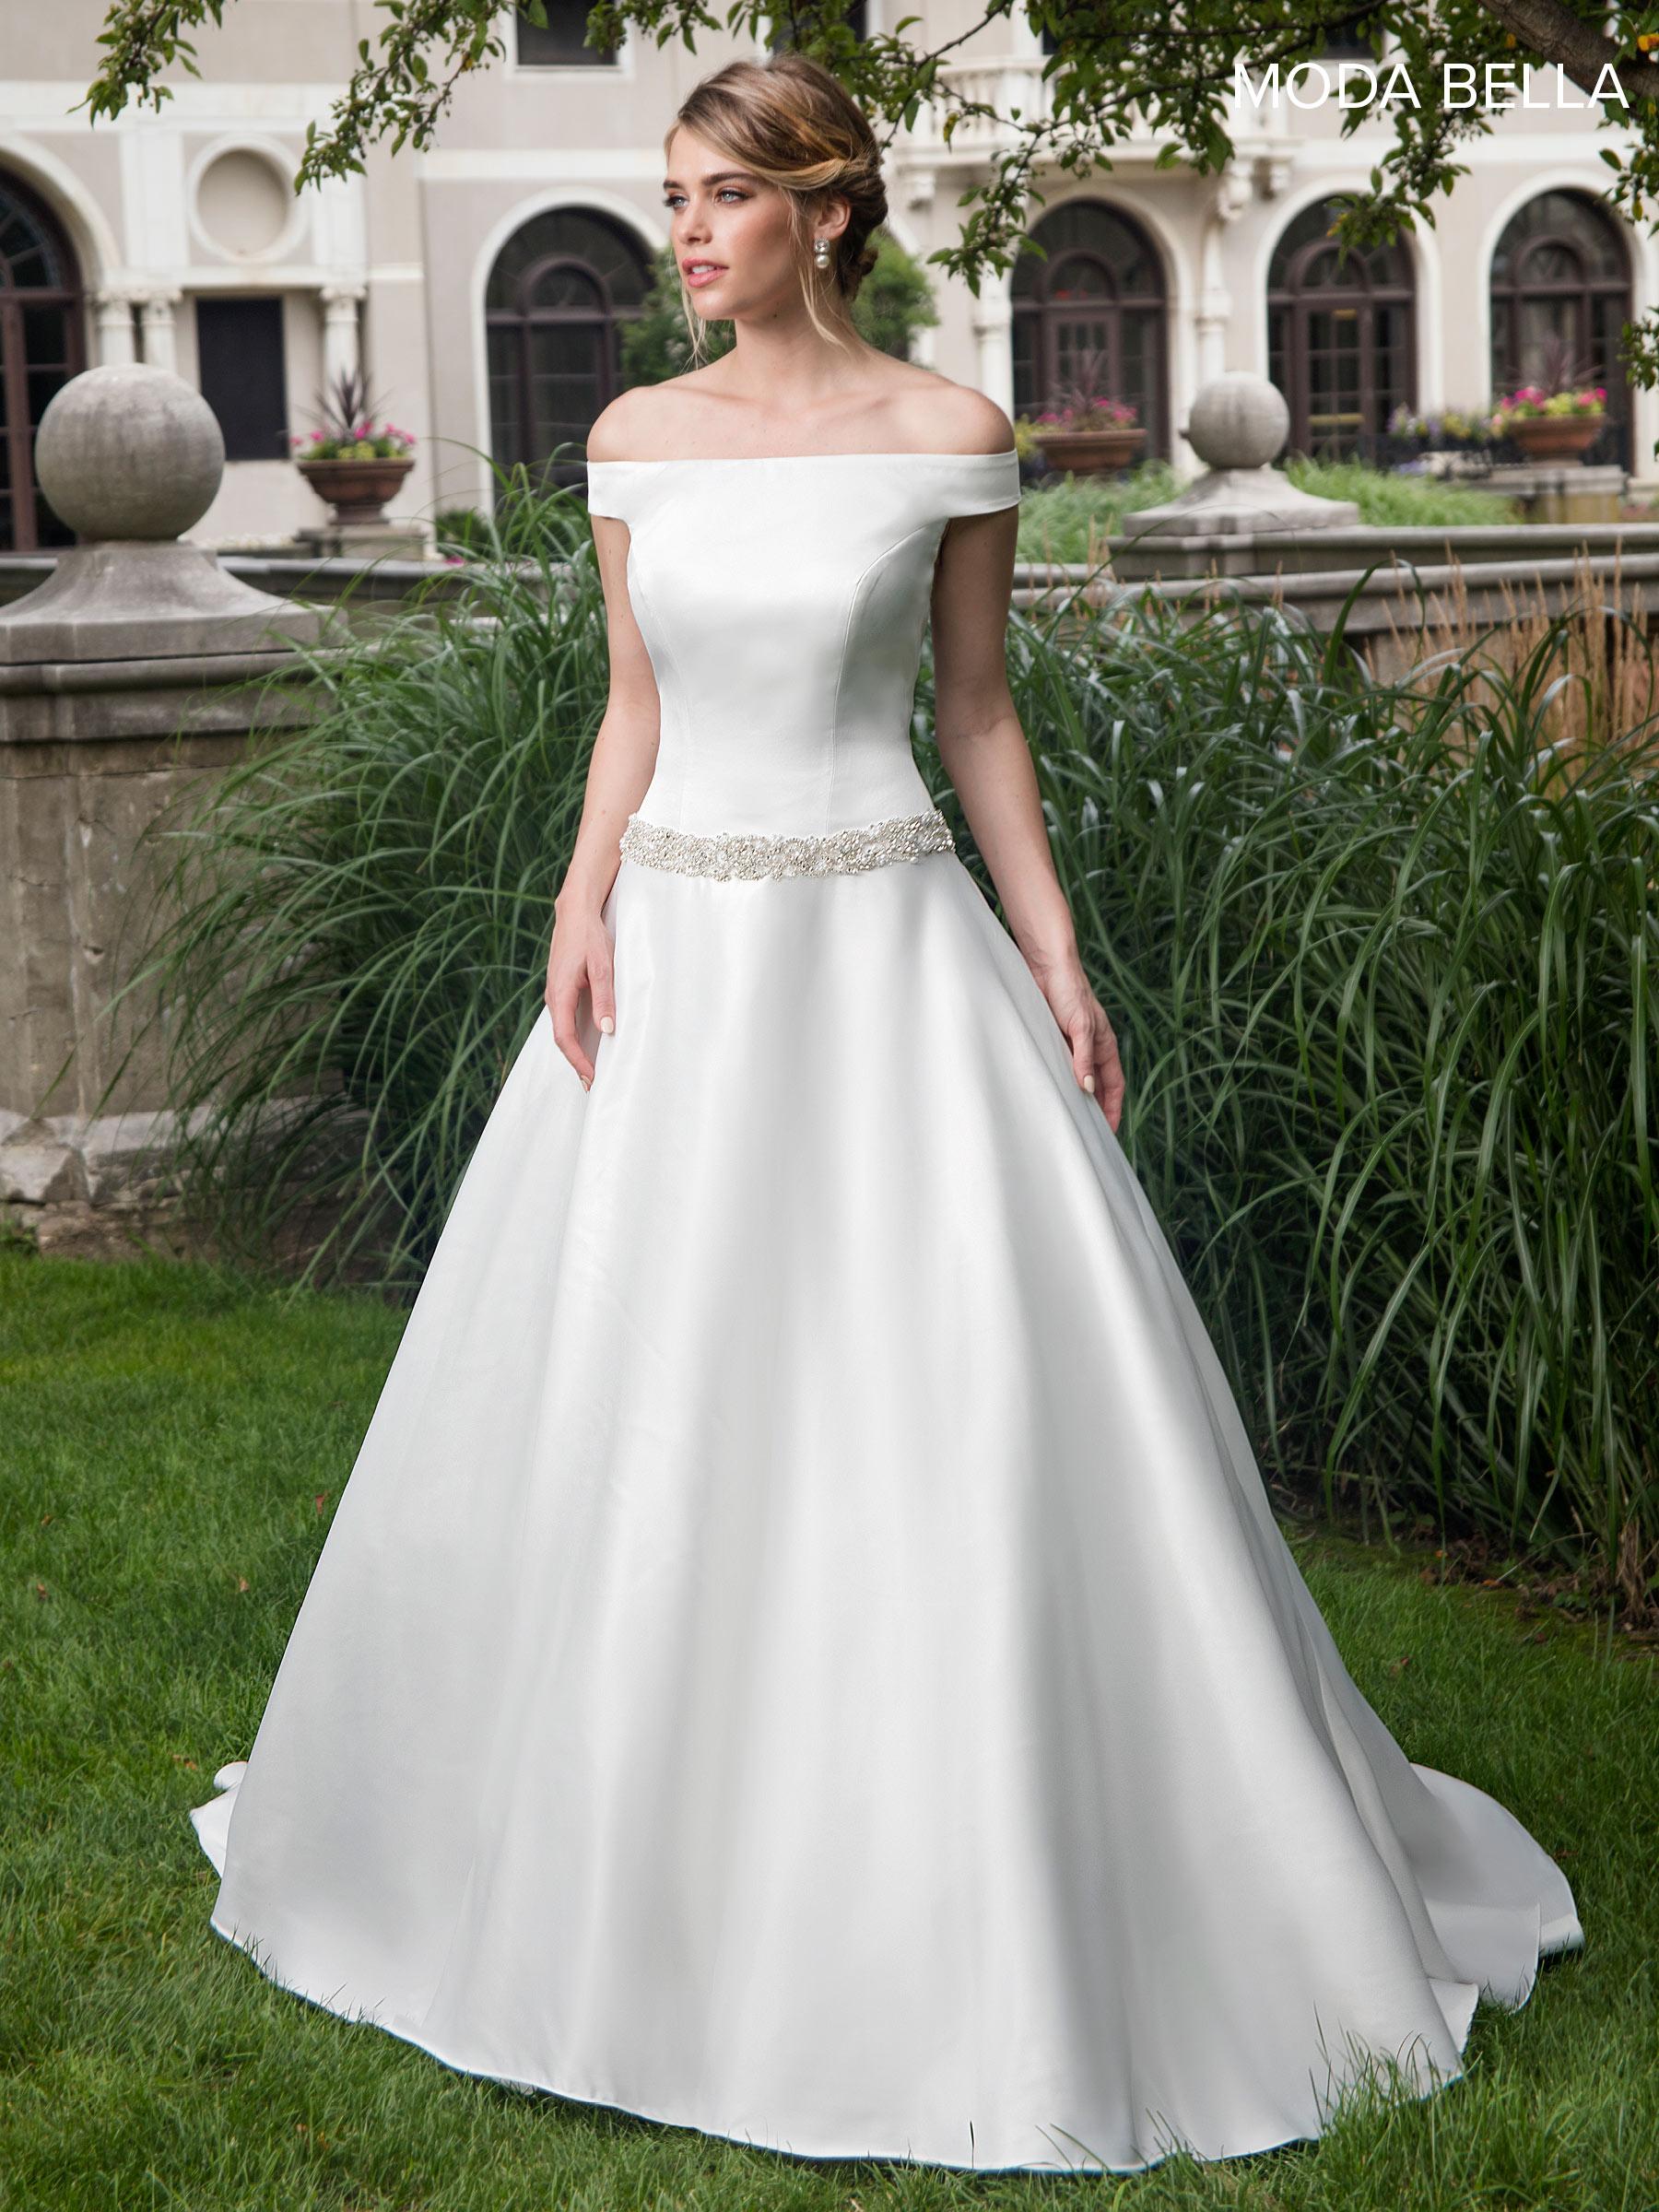 Bridal Dresses | Moda Bella | Style - MB2009